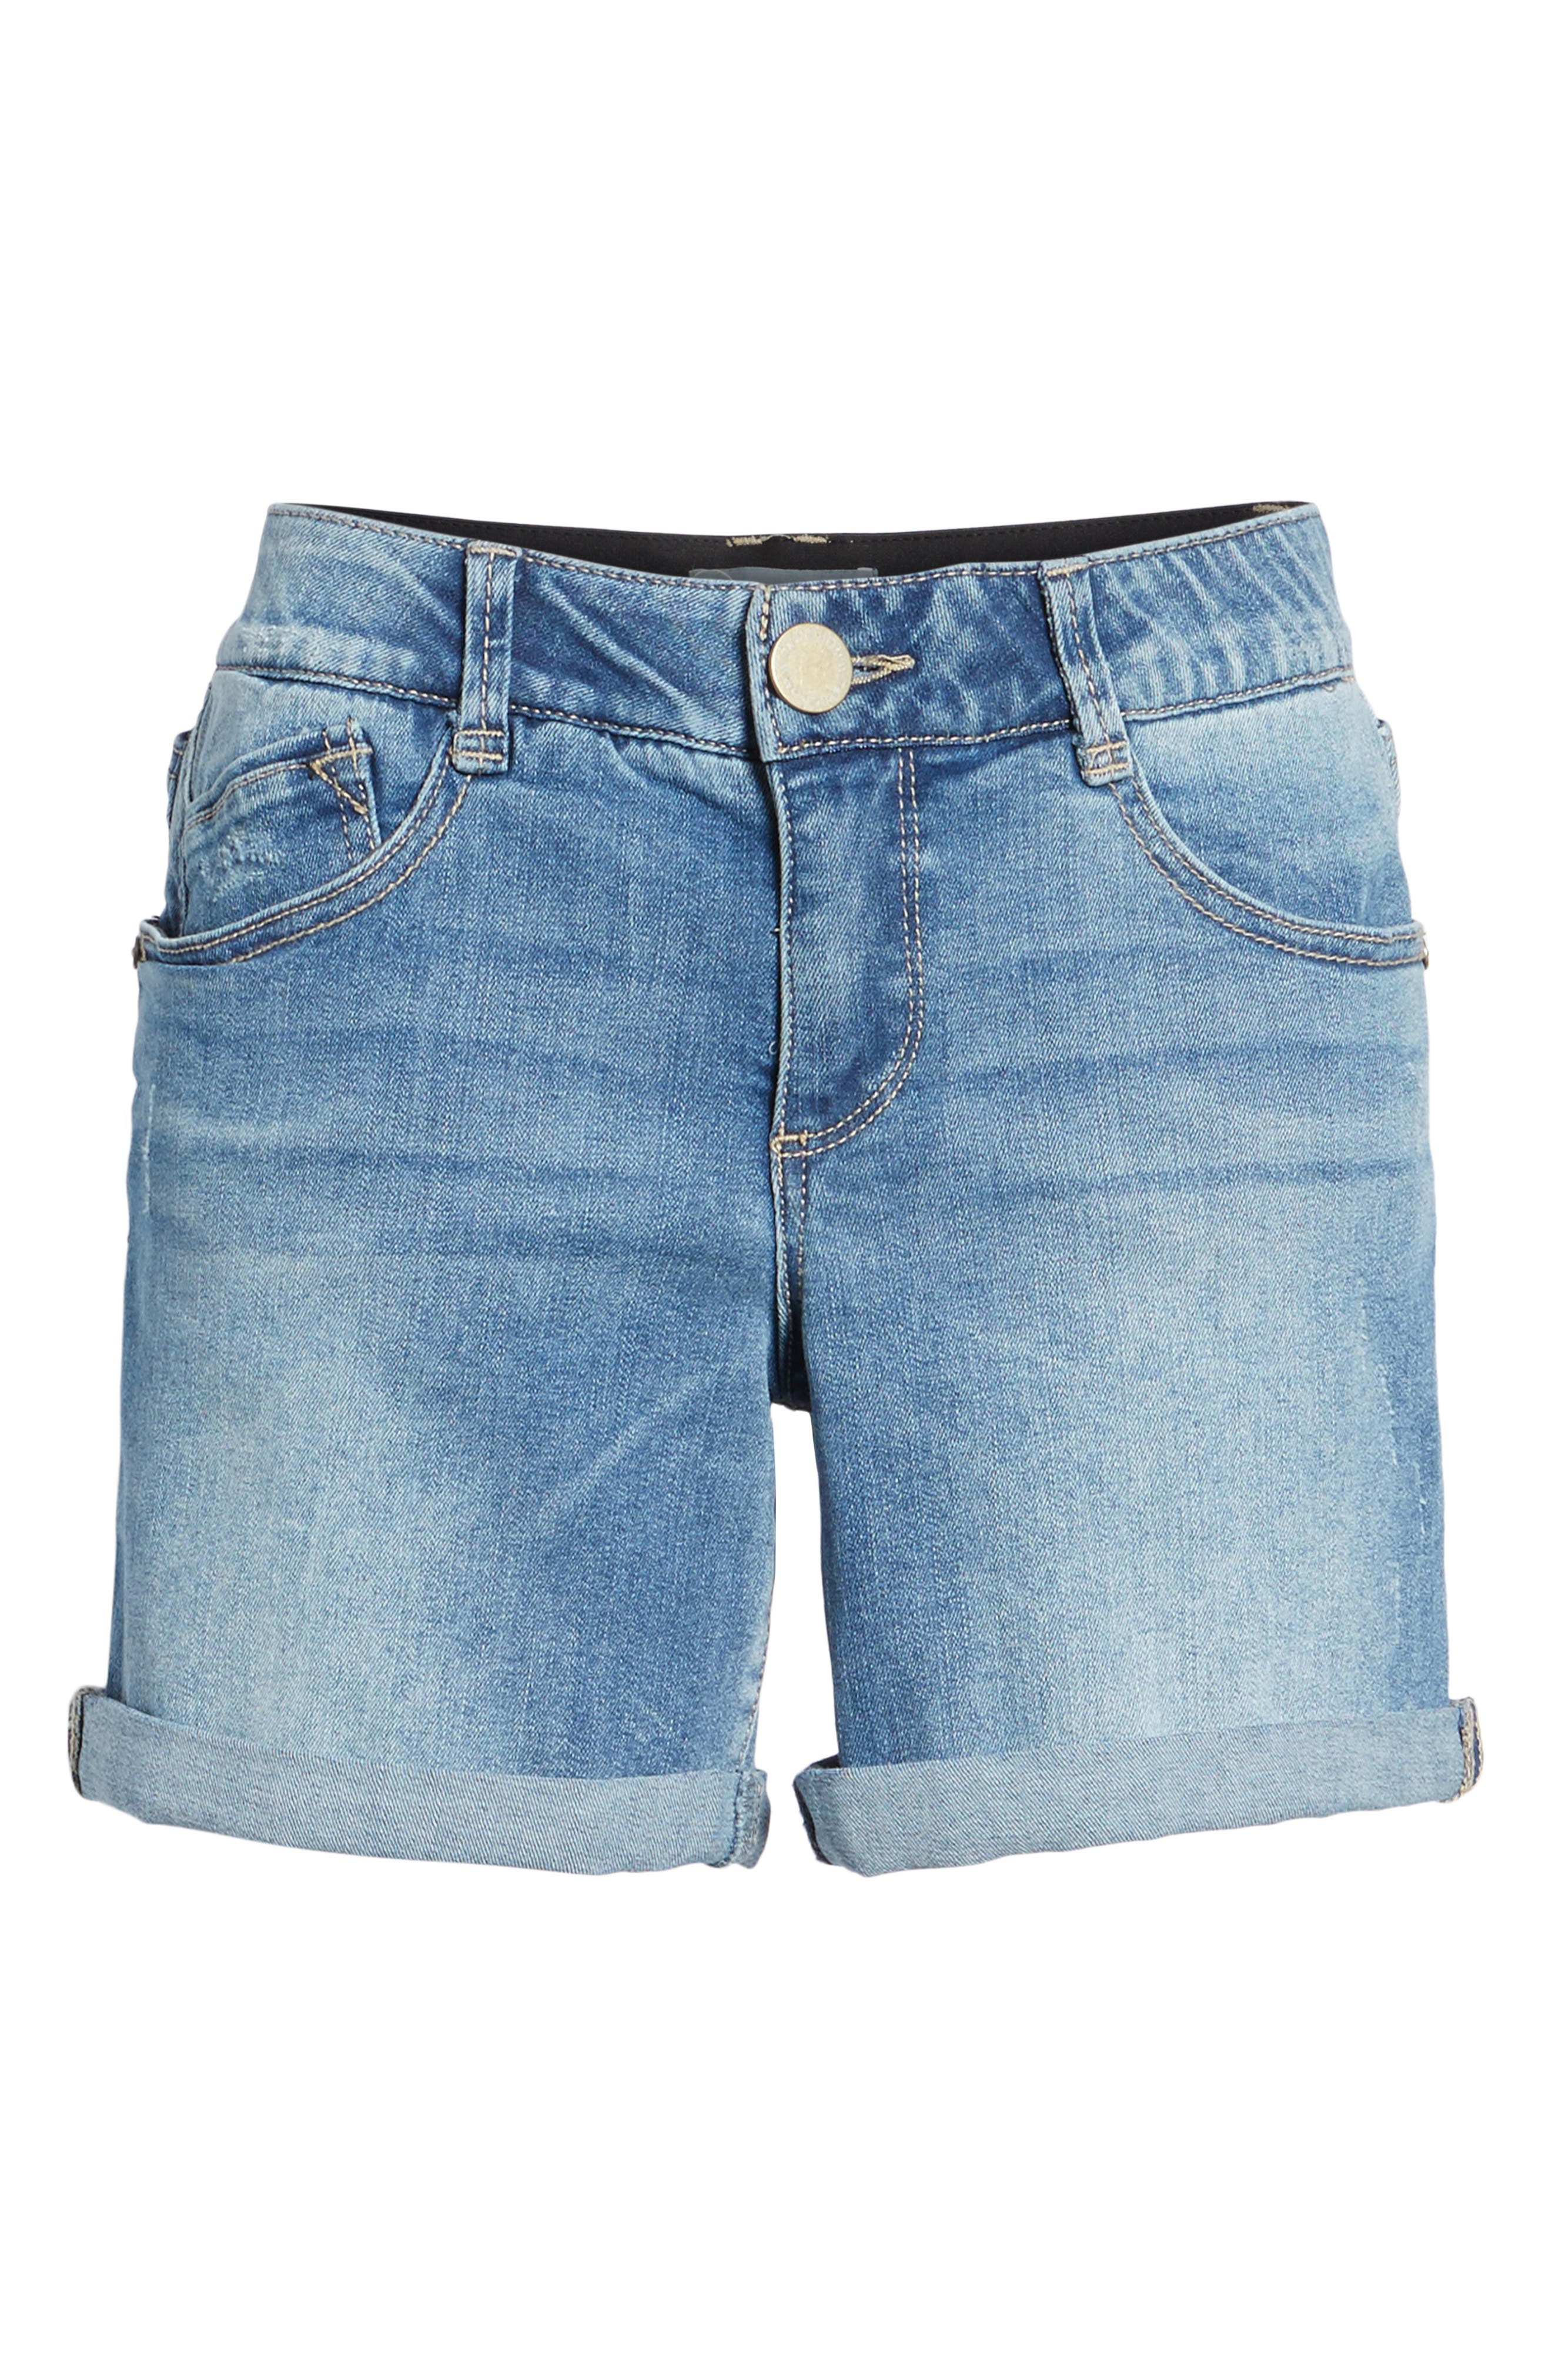 Ab-solution Denim Shorts,                             Alternate thumbnail 6, color,                             458